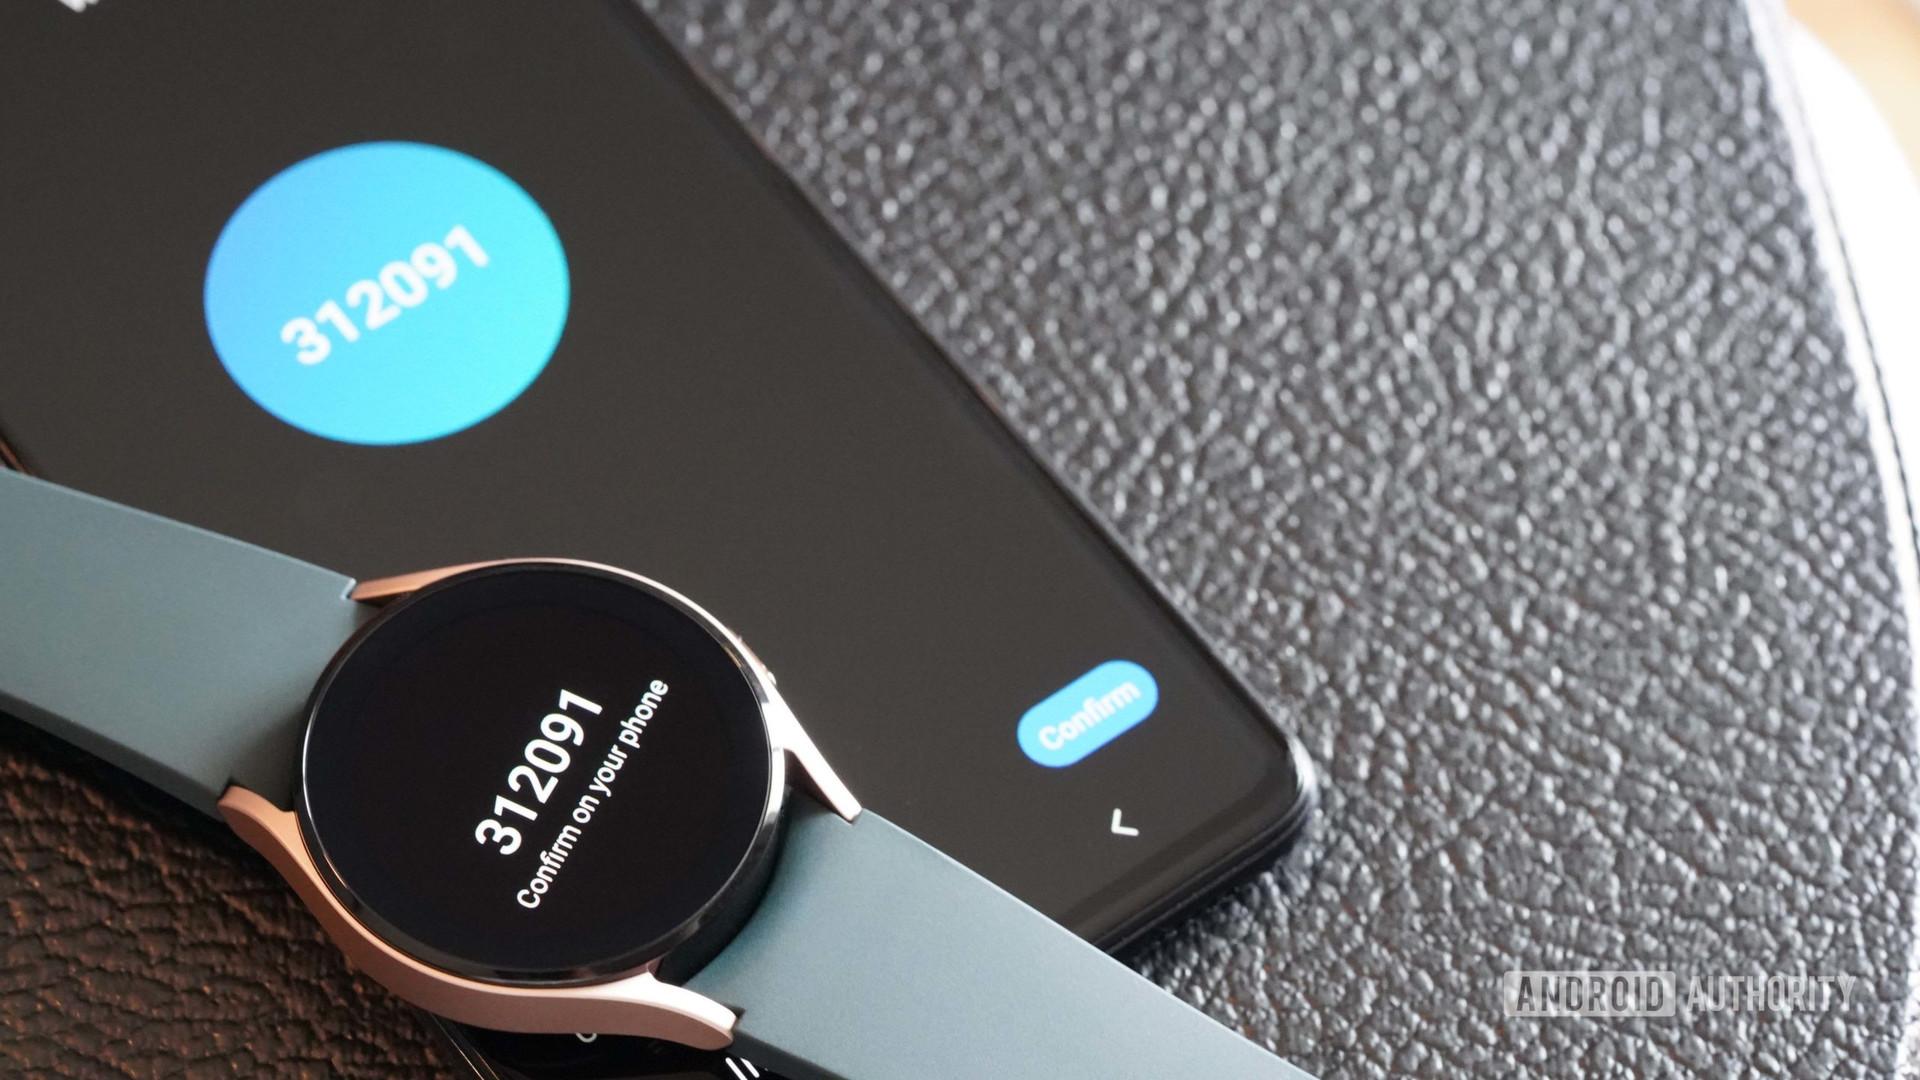 A Galaxy Watch 4 pairs to a Galaxy A51 phone.